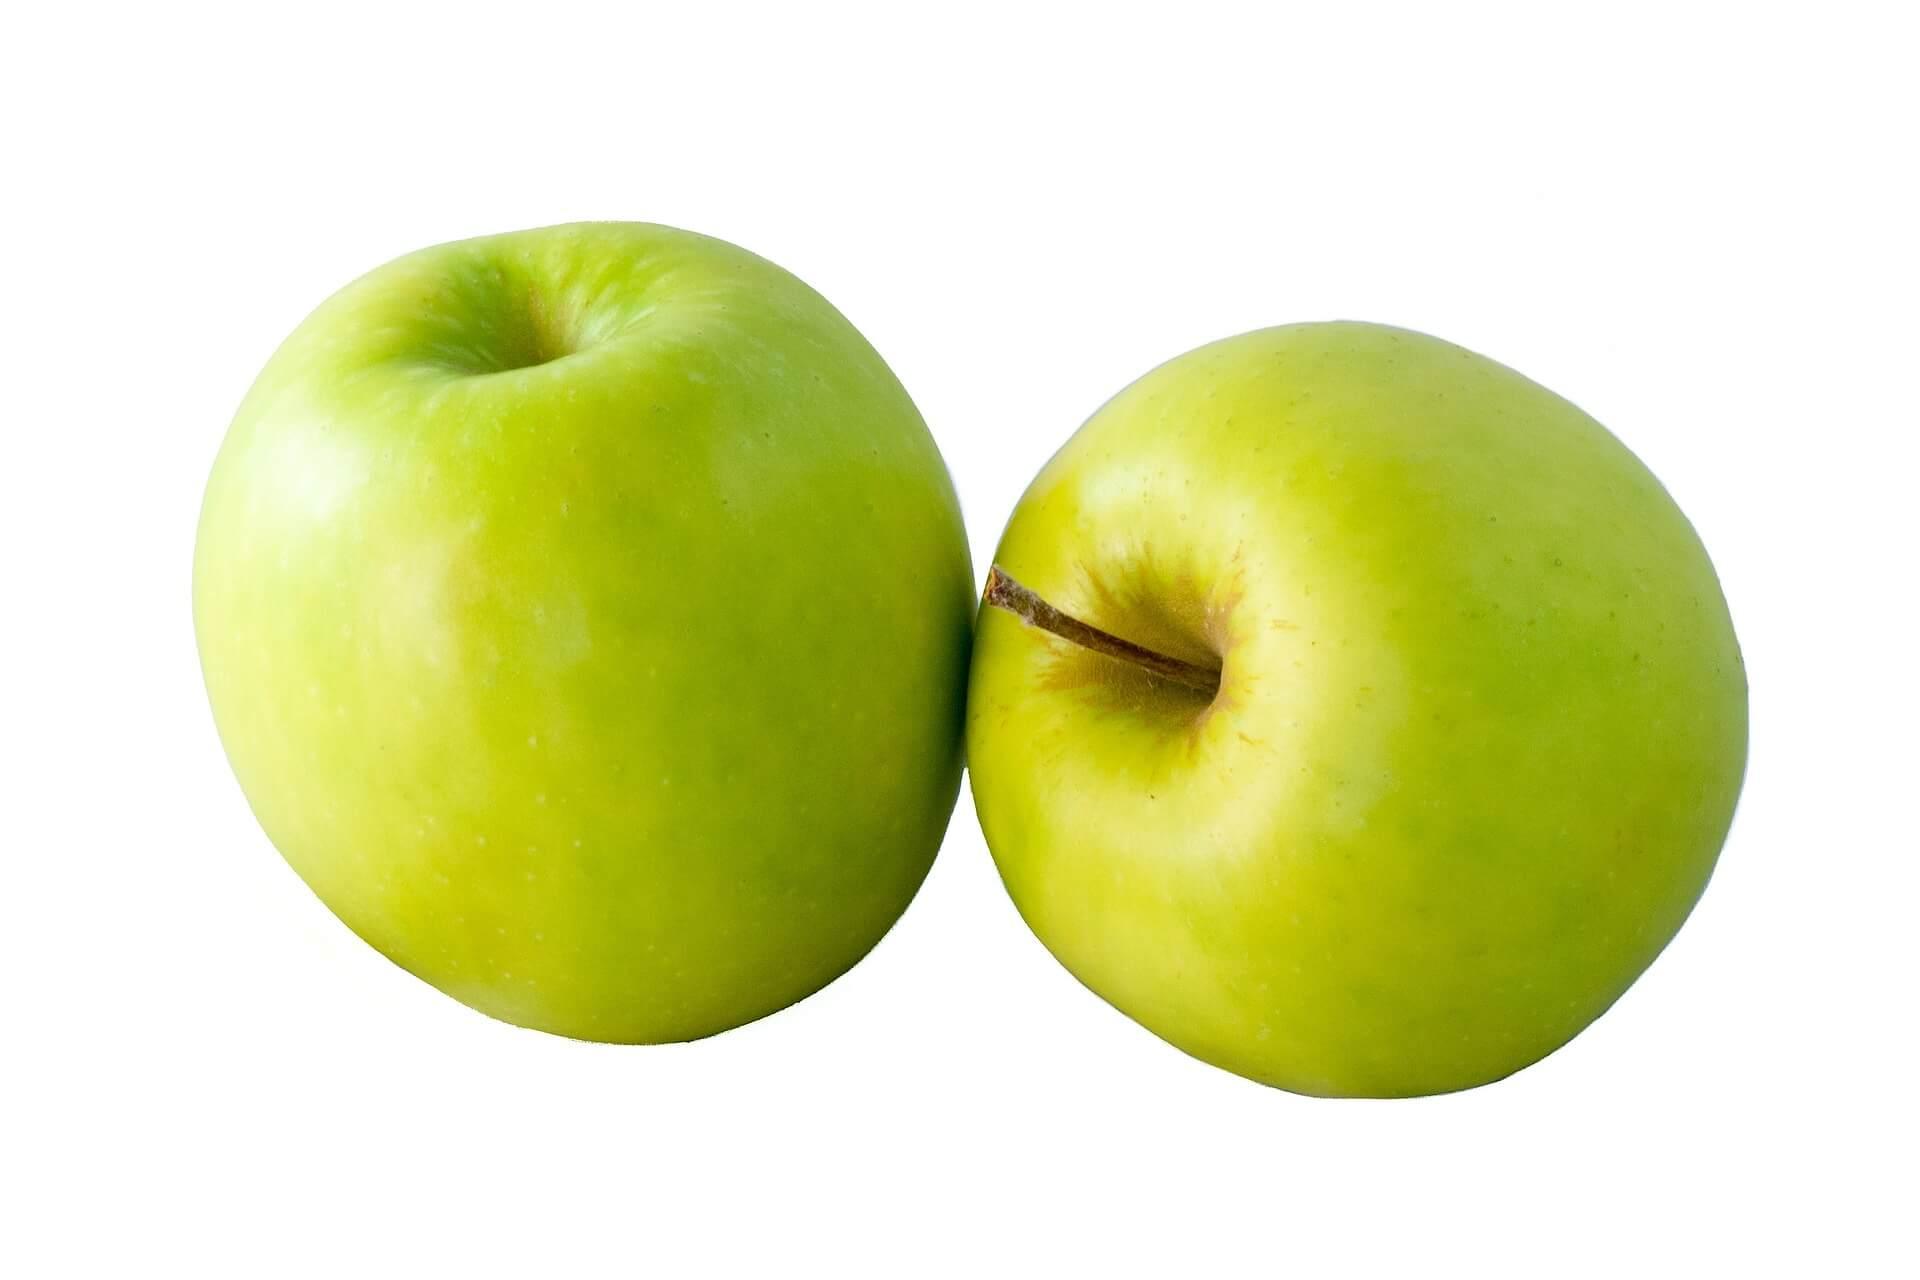 apple-174863_1920-1.jpg